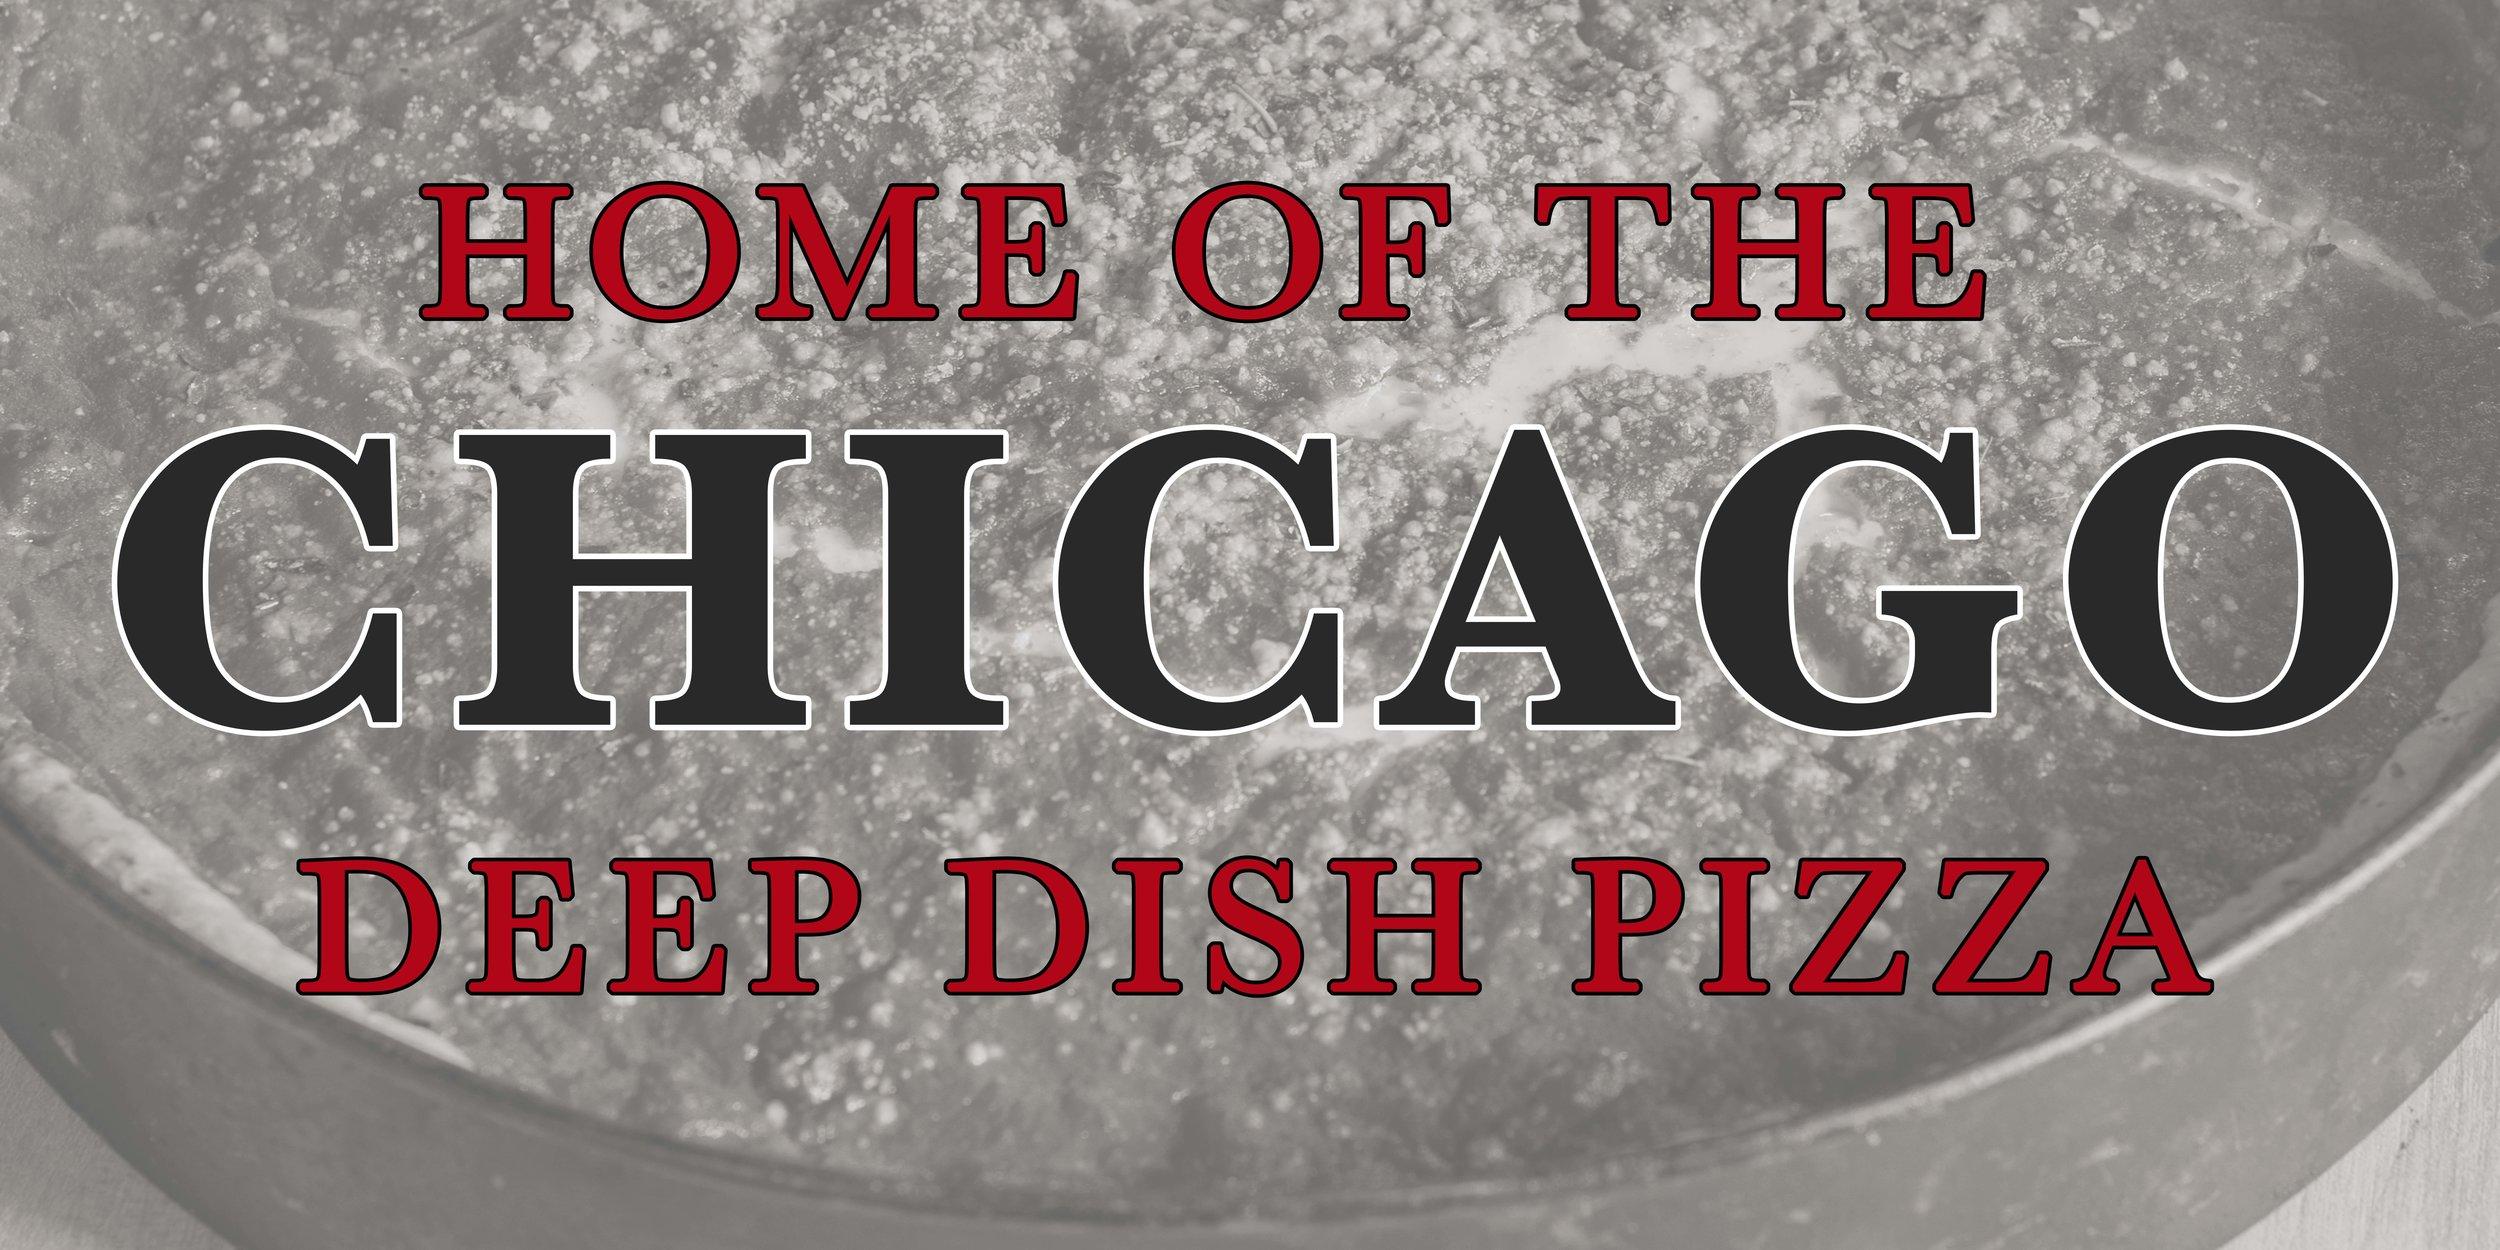 chicago deep dish pizza.jpg